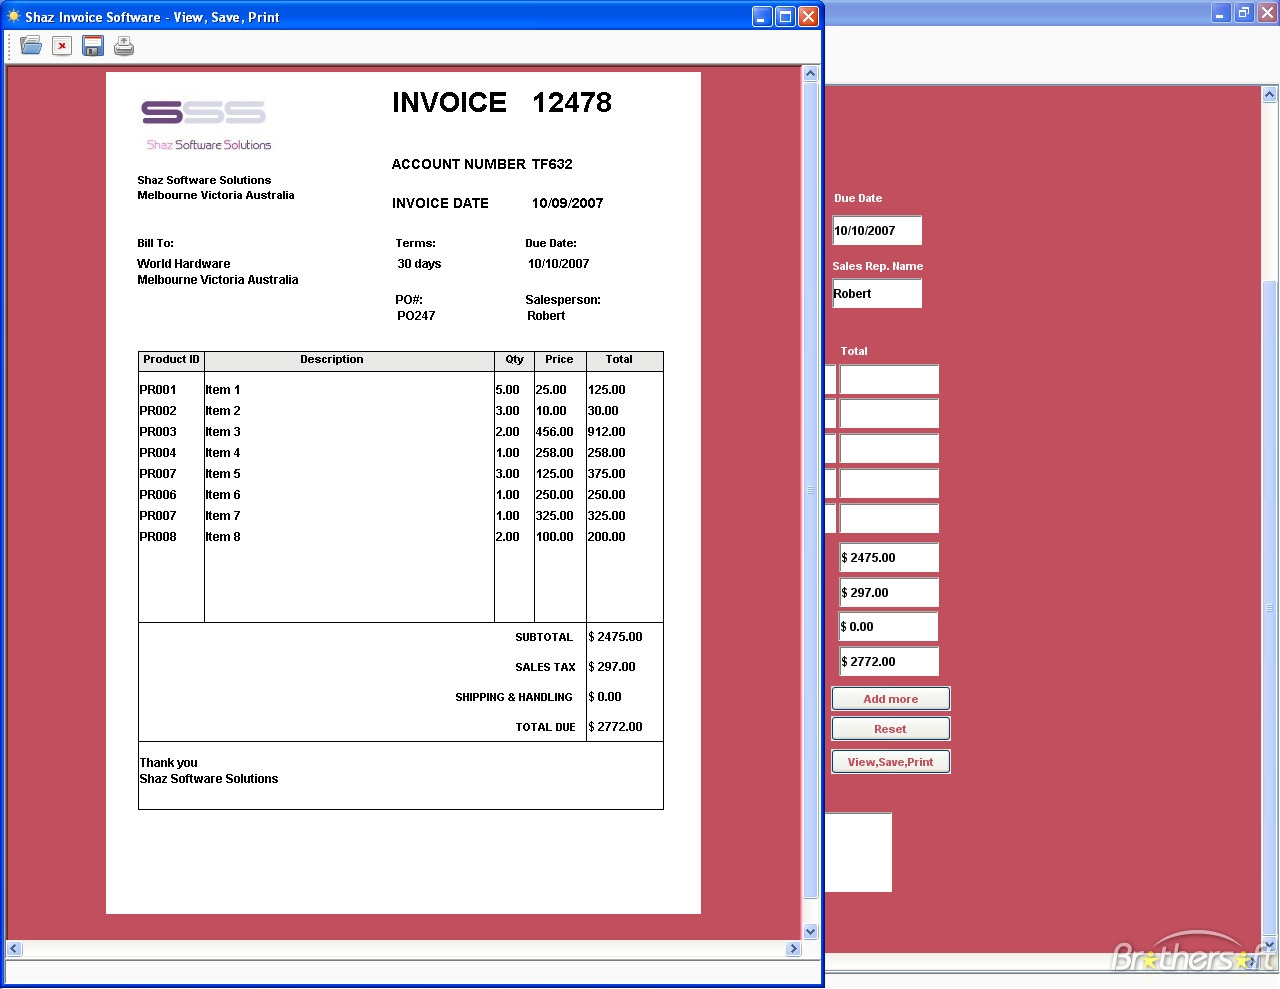 download free shaz invoice software shaz invoice software 100 free invoice software for small business